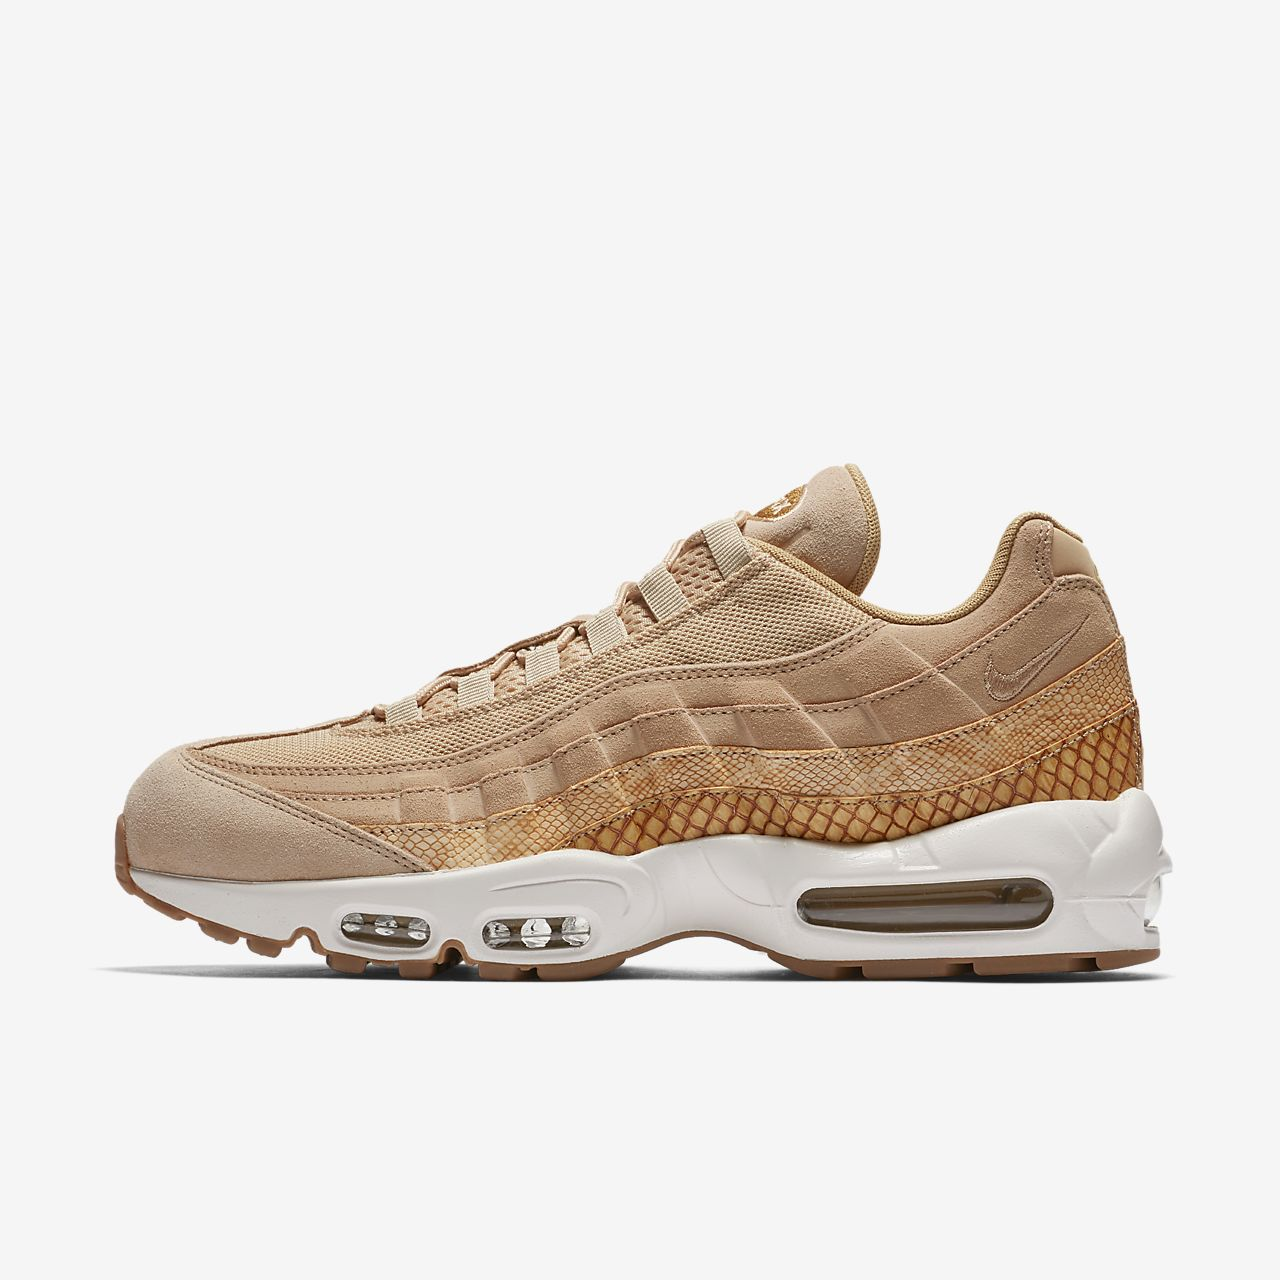 Men's Shoe. Nike Air Max 95 Premium SE